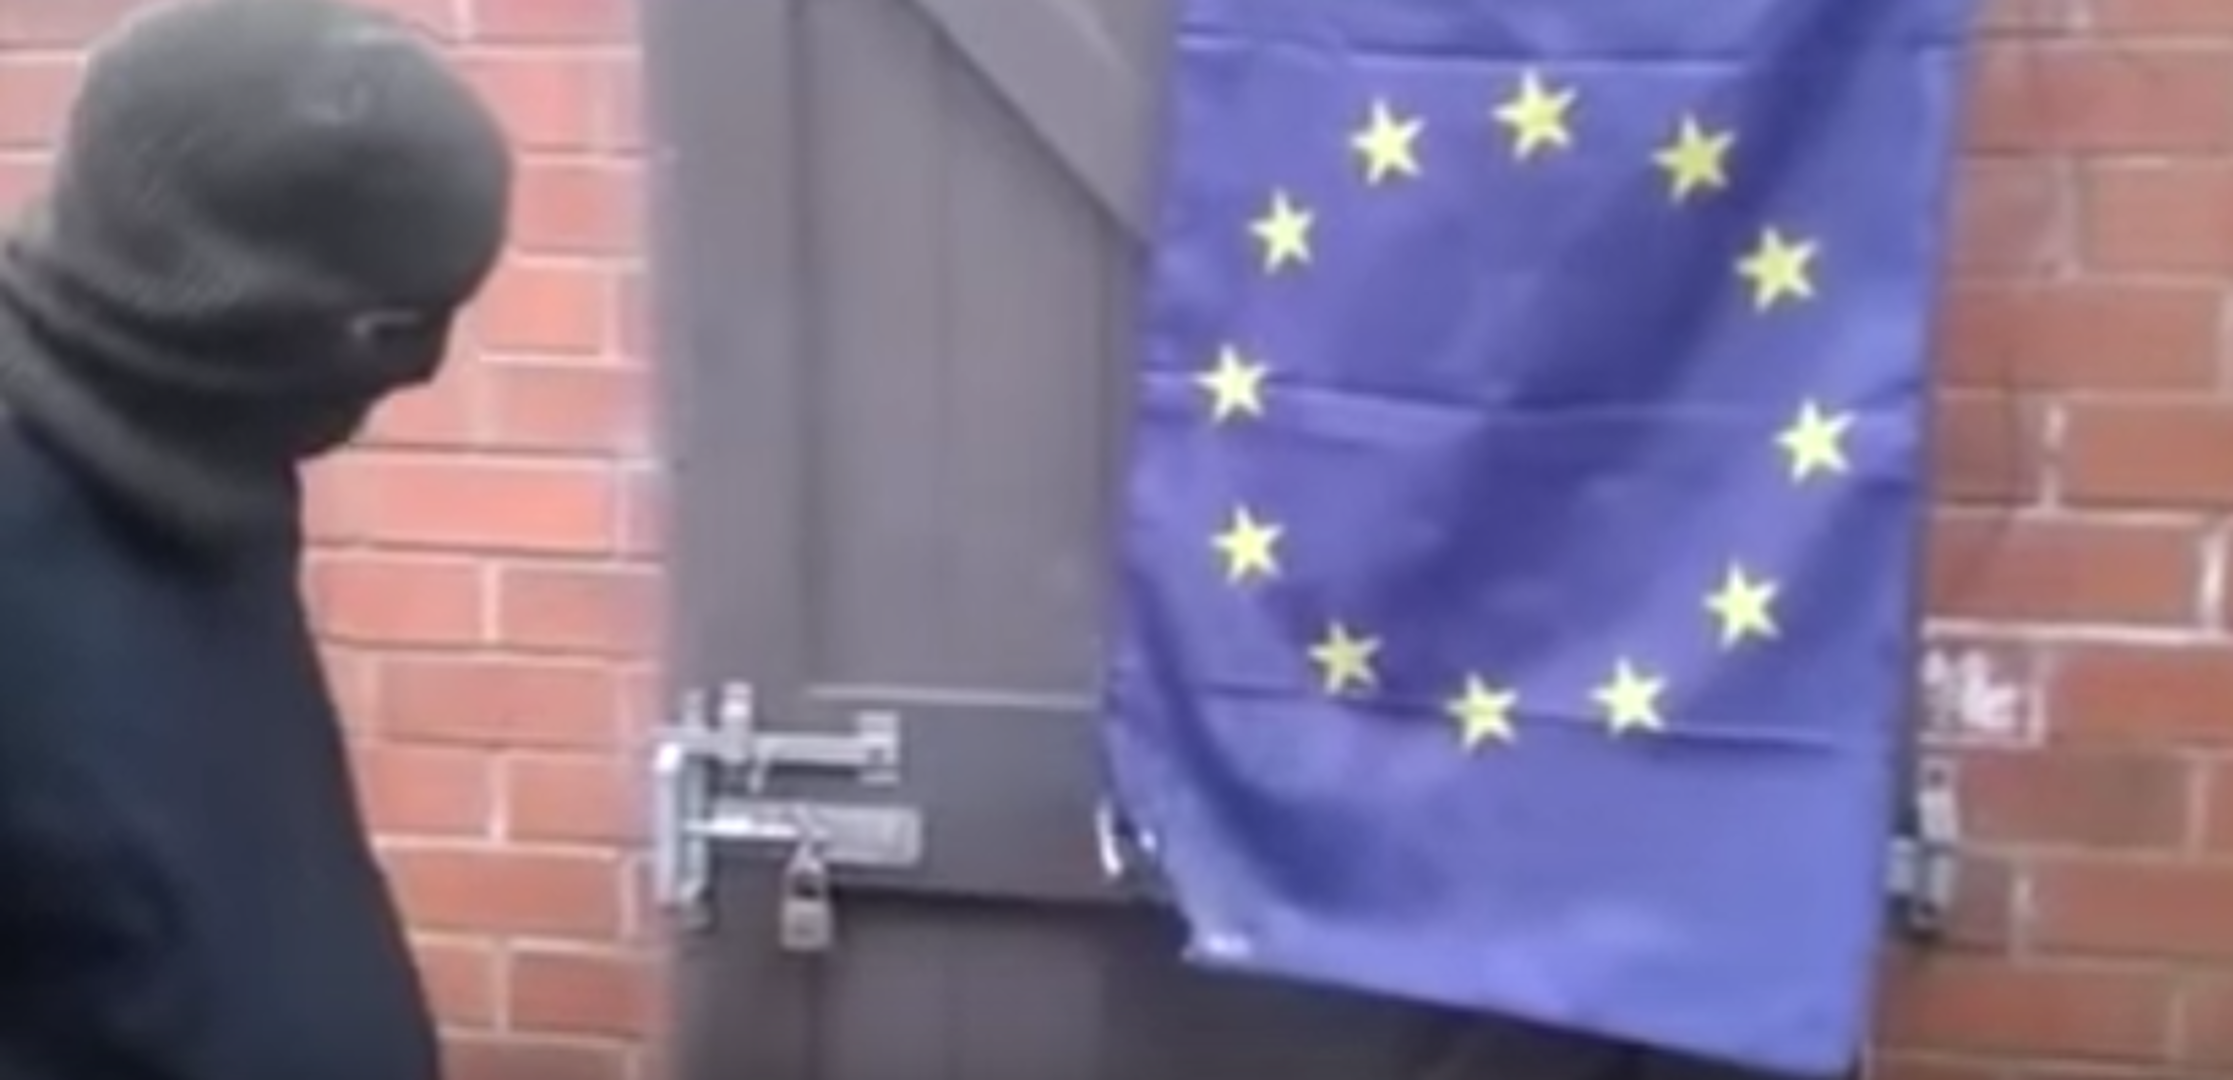 Flash: Brexit - EU Flagge brennt nicht